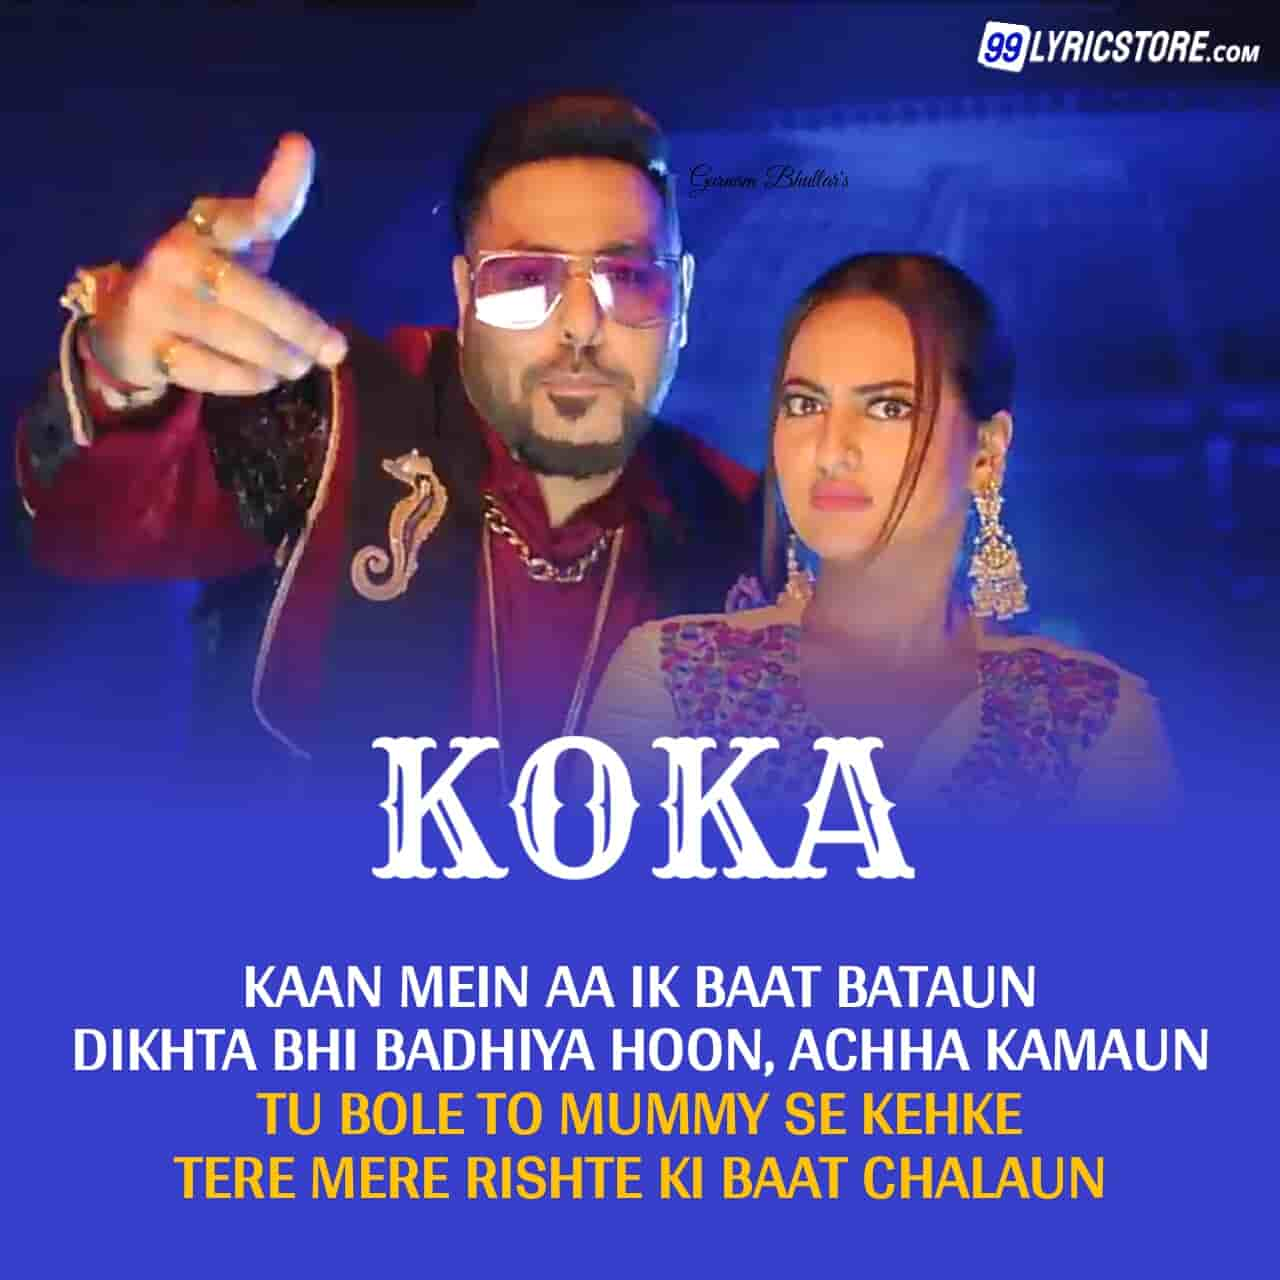 Koka hip hop song sung by badshah from movie Khandaani Shafakhana